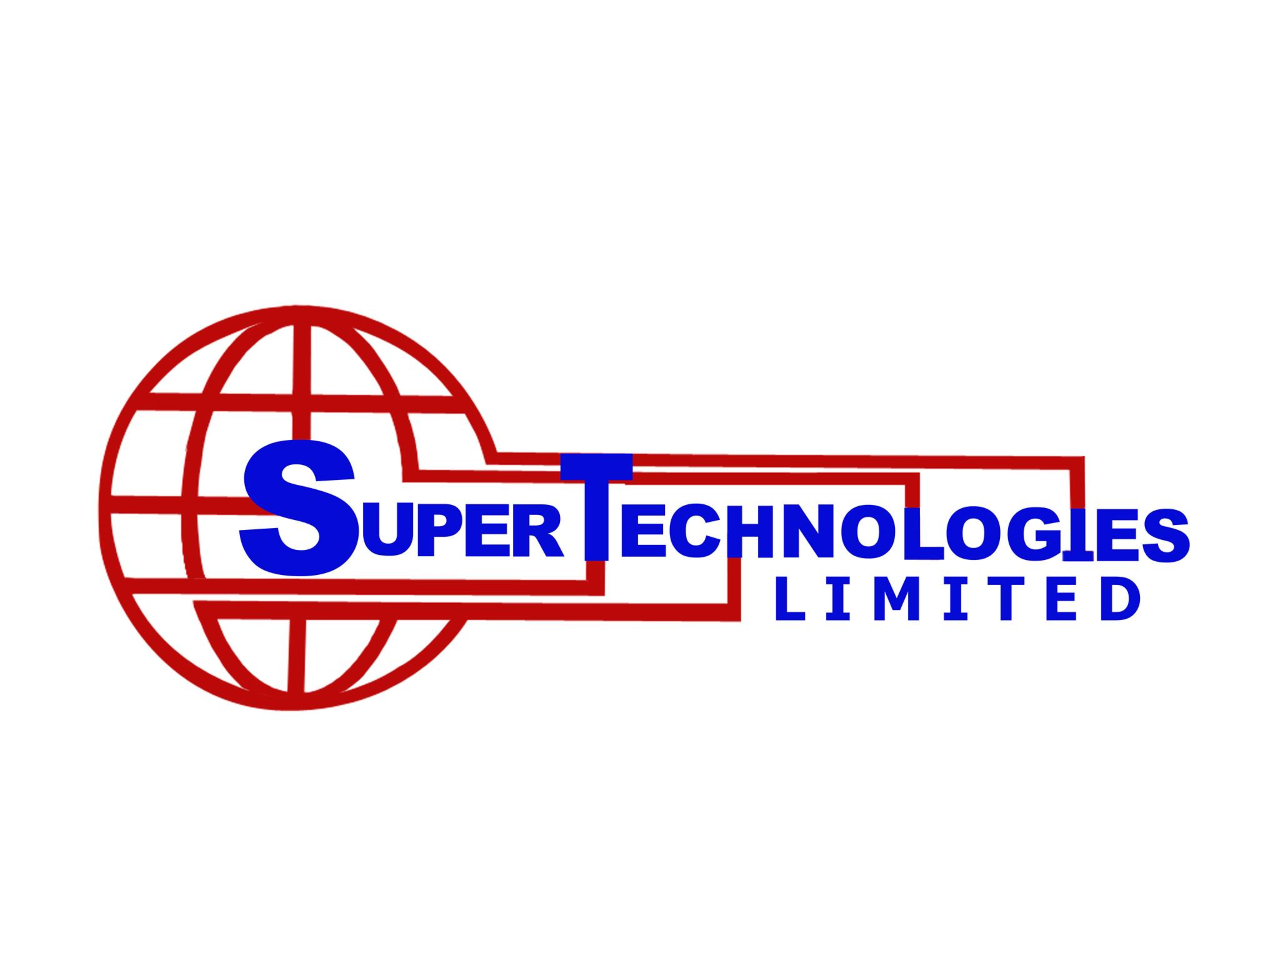 Super Technologies Ltd